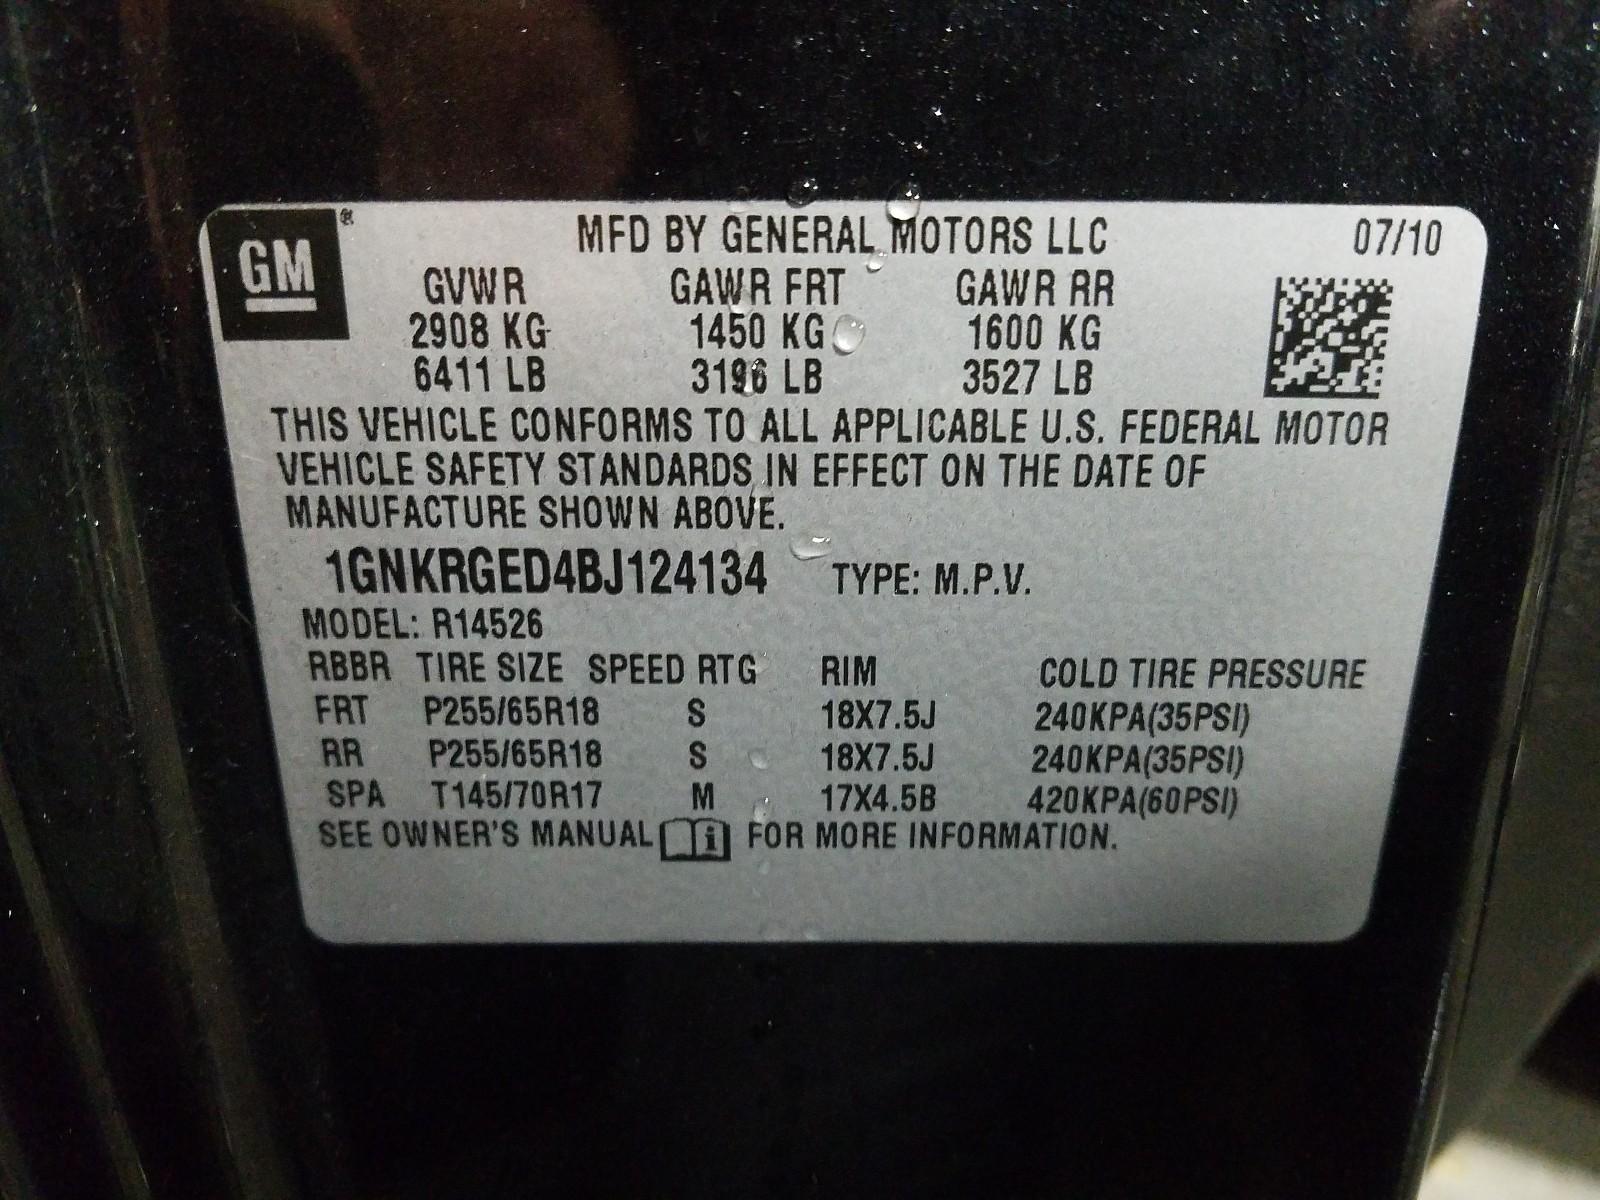 1GNKRGED4BJ124134 - 2011 Chevrolet Traverse L 3.6L